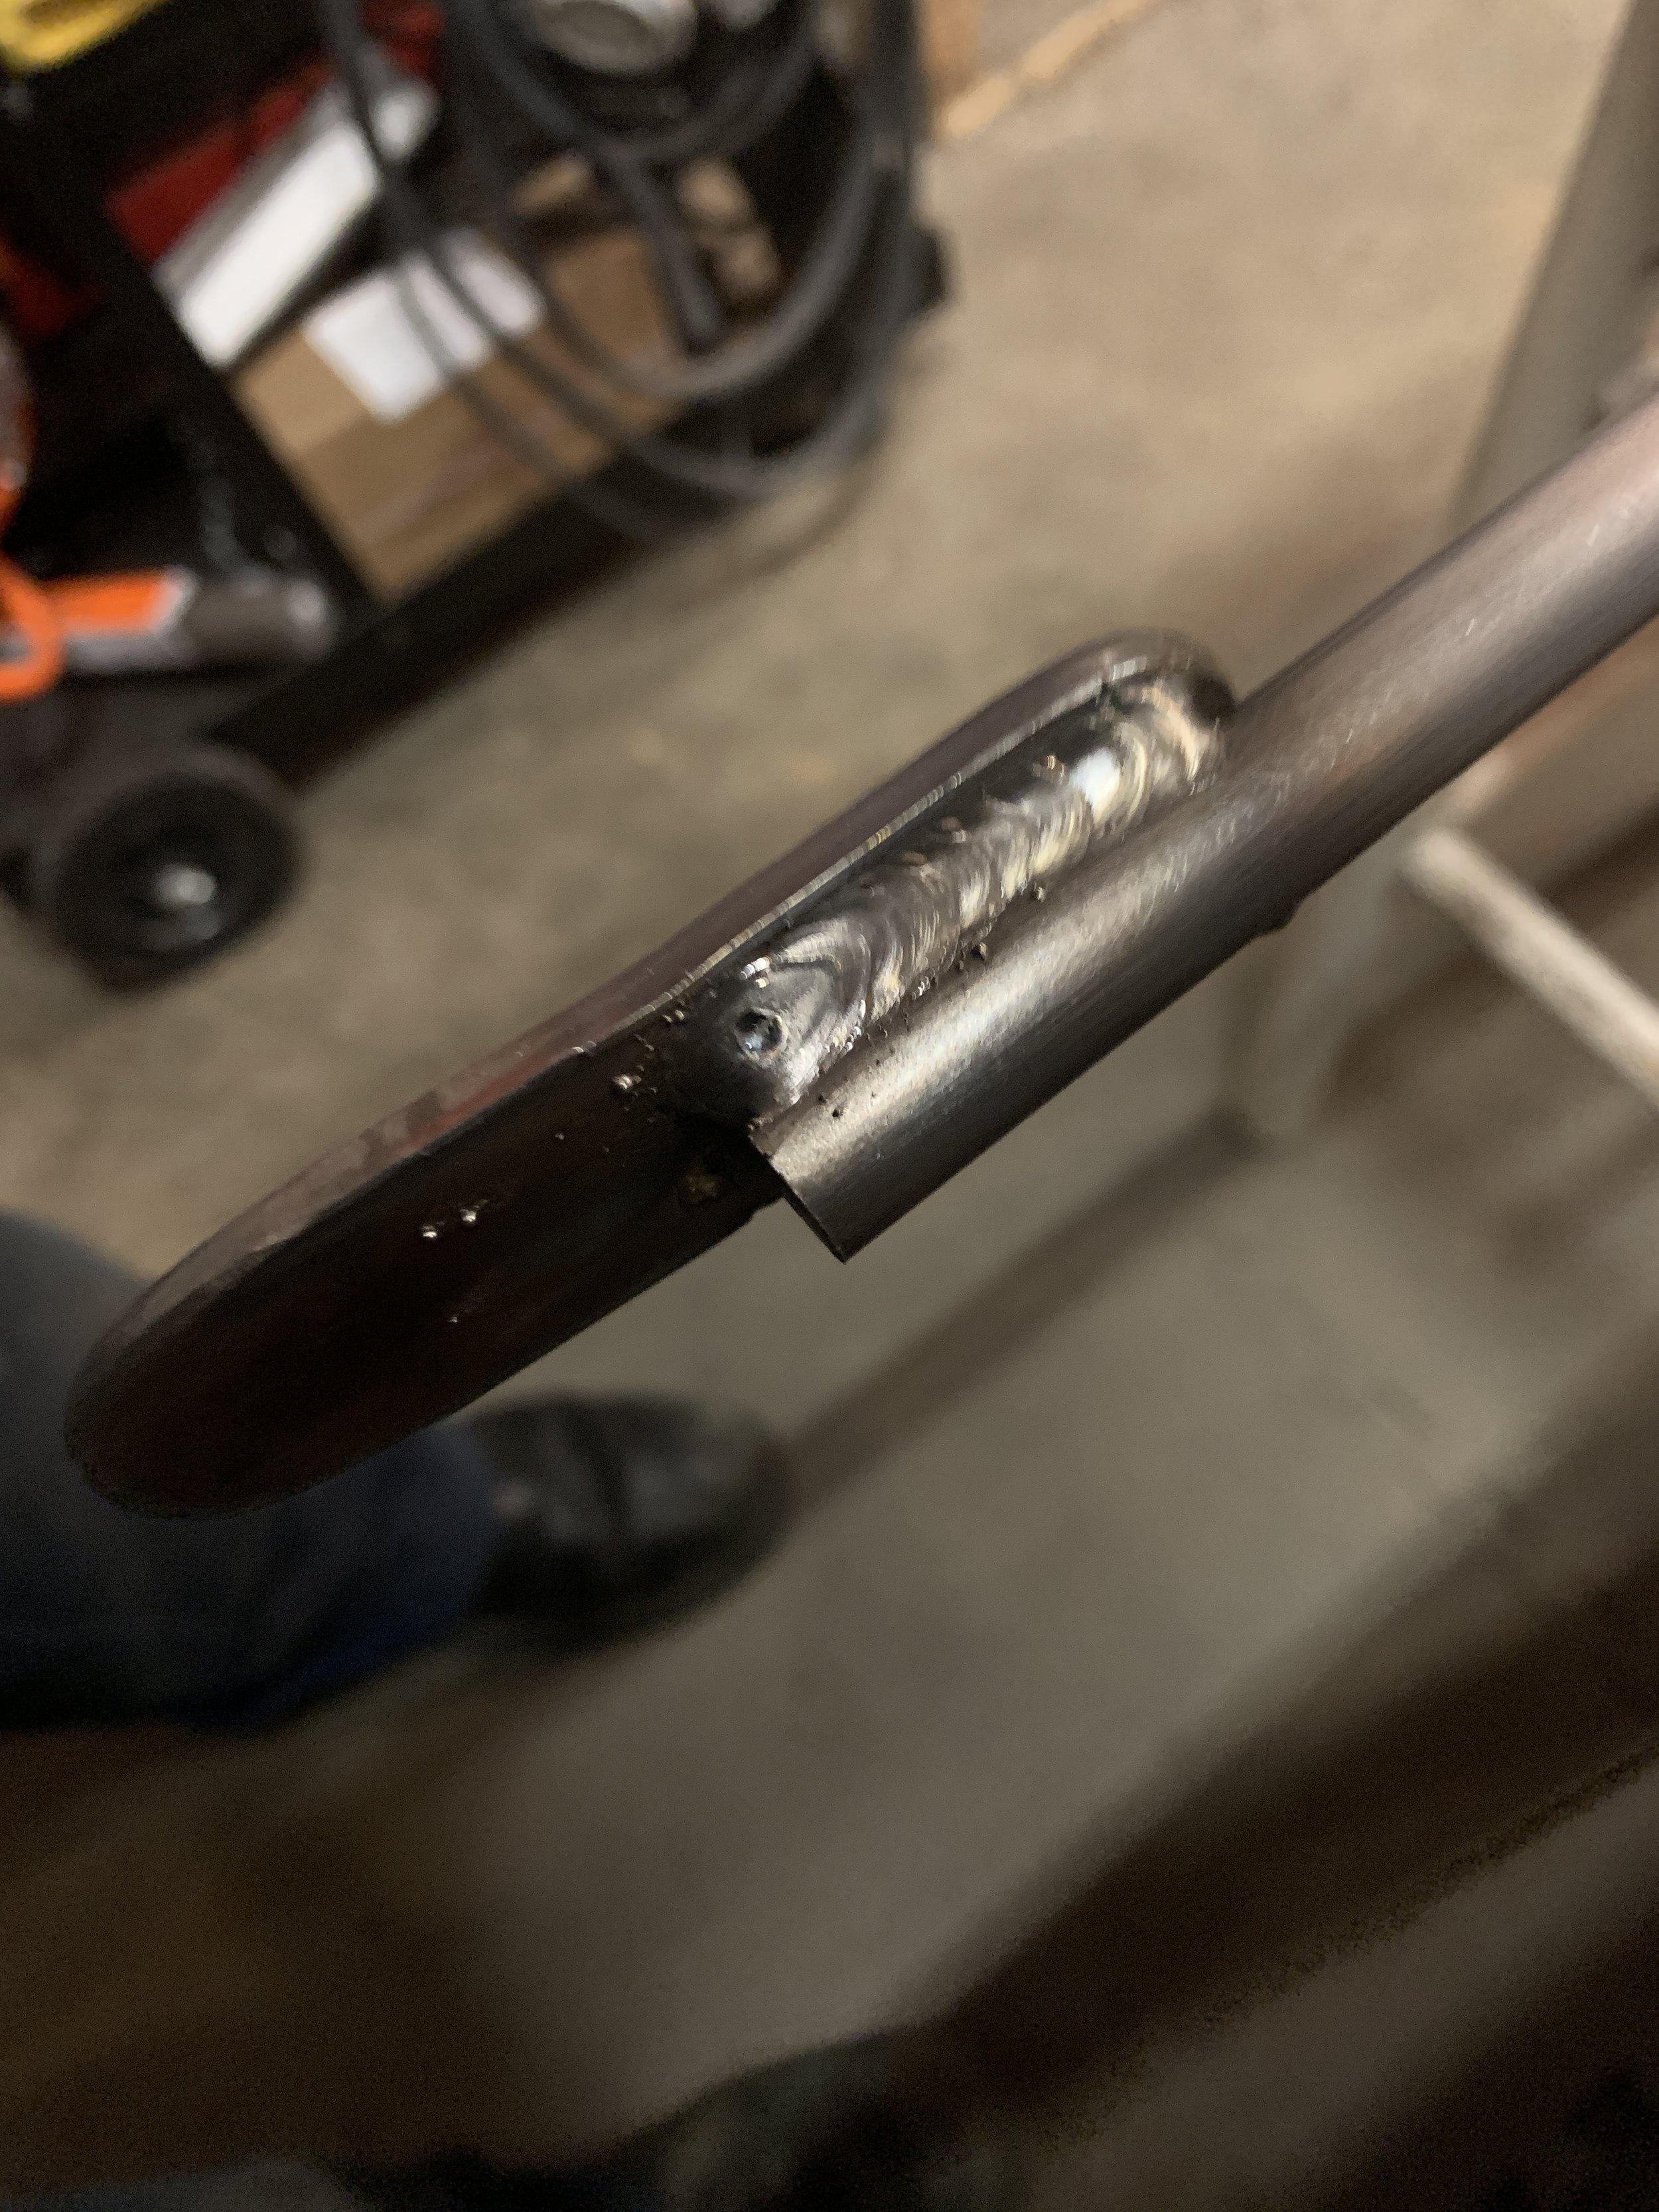 Hard tail welds